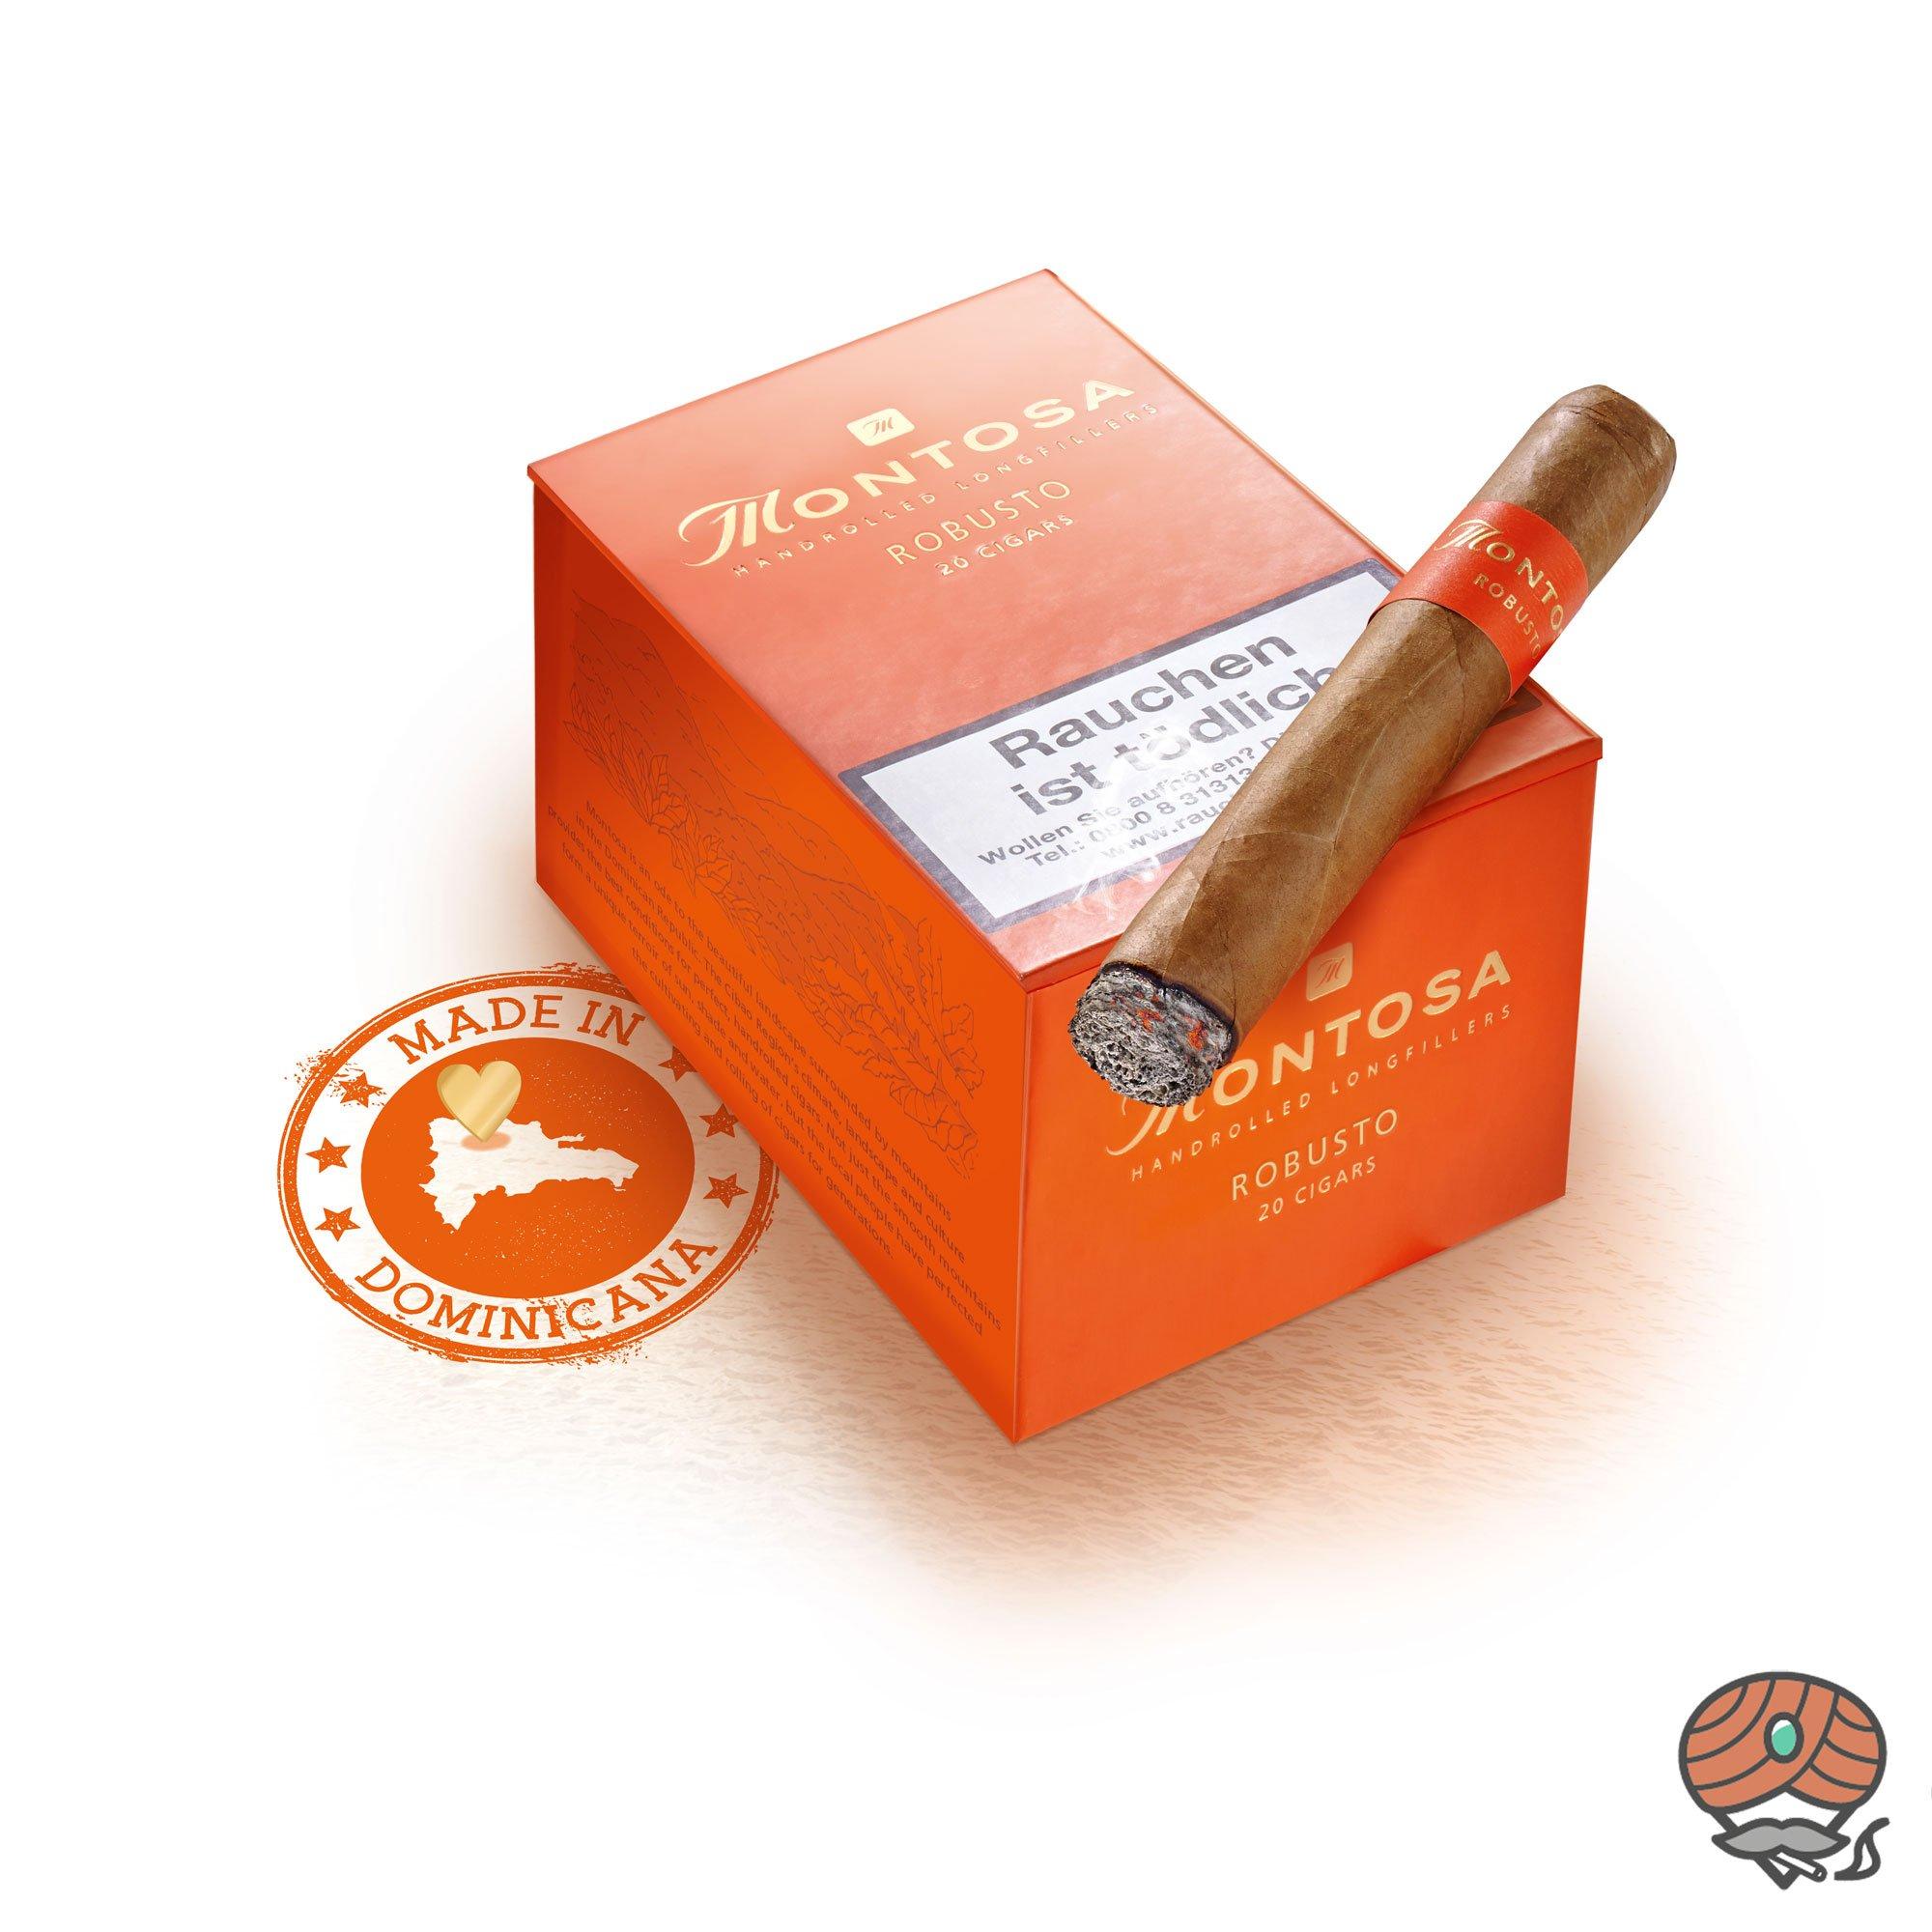 Montosa Robusto Zigarren 20 Stück, Dominikanische Republik